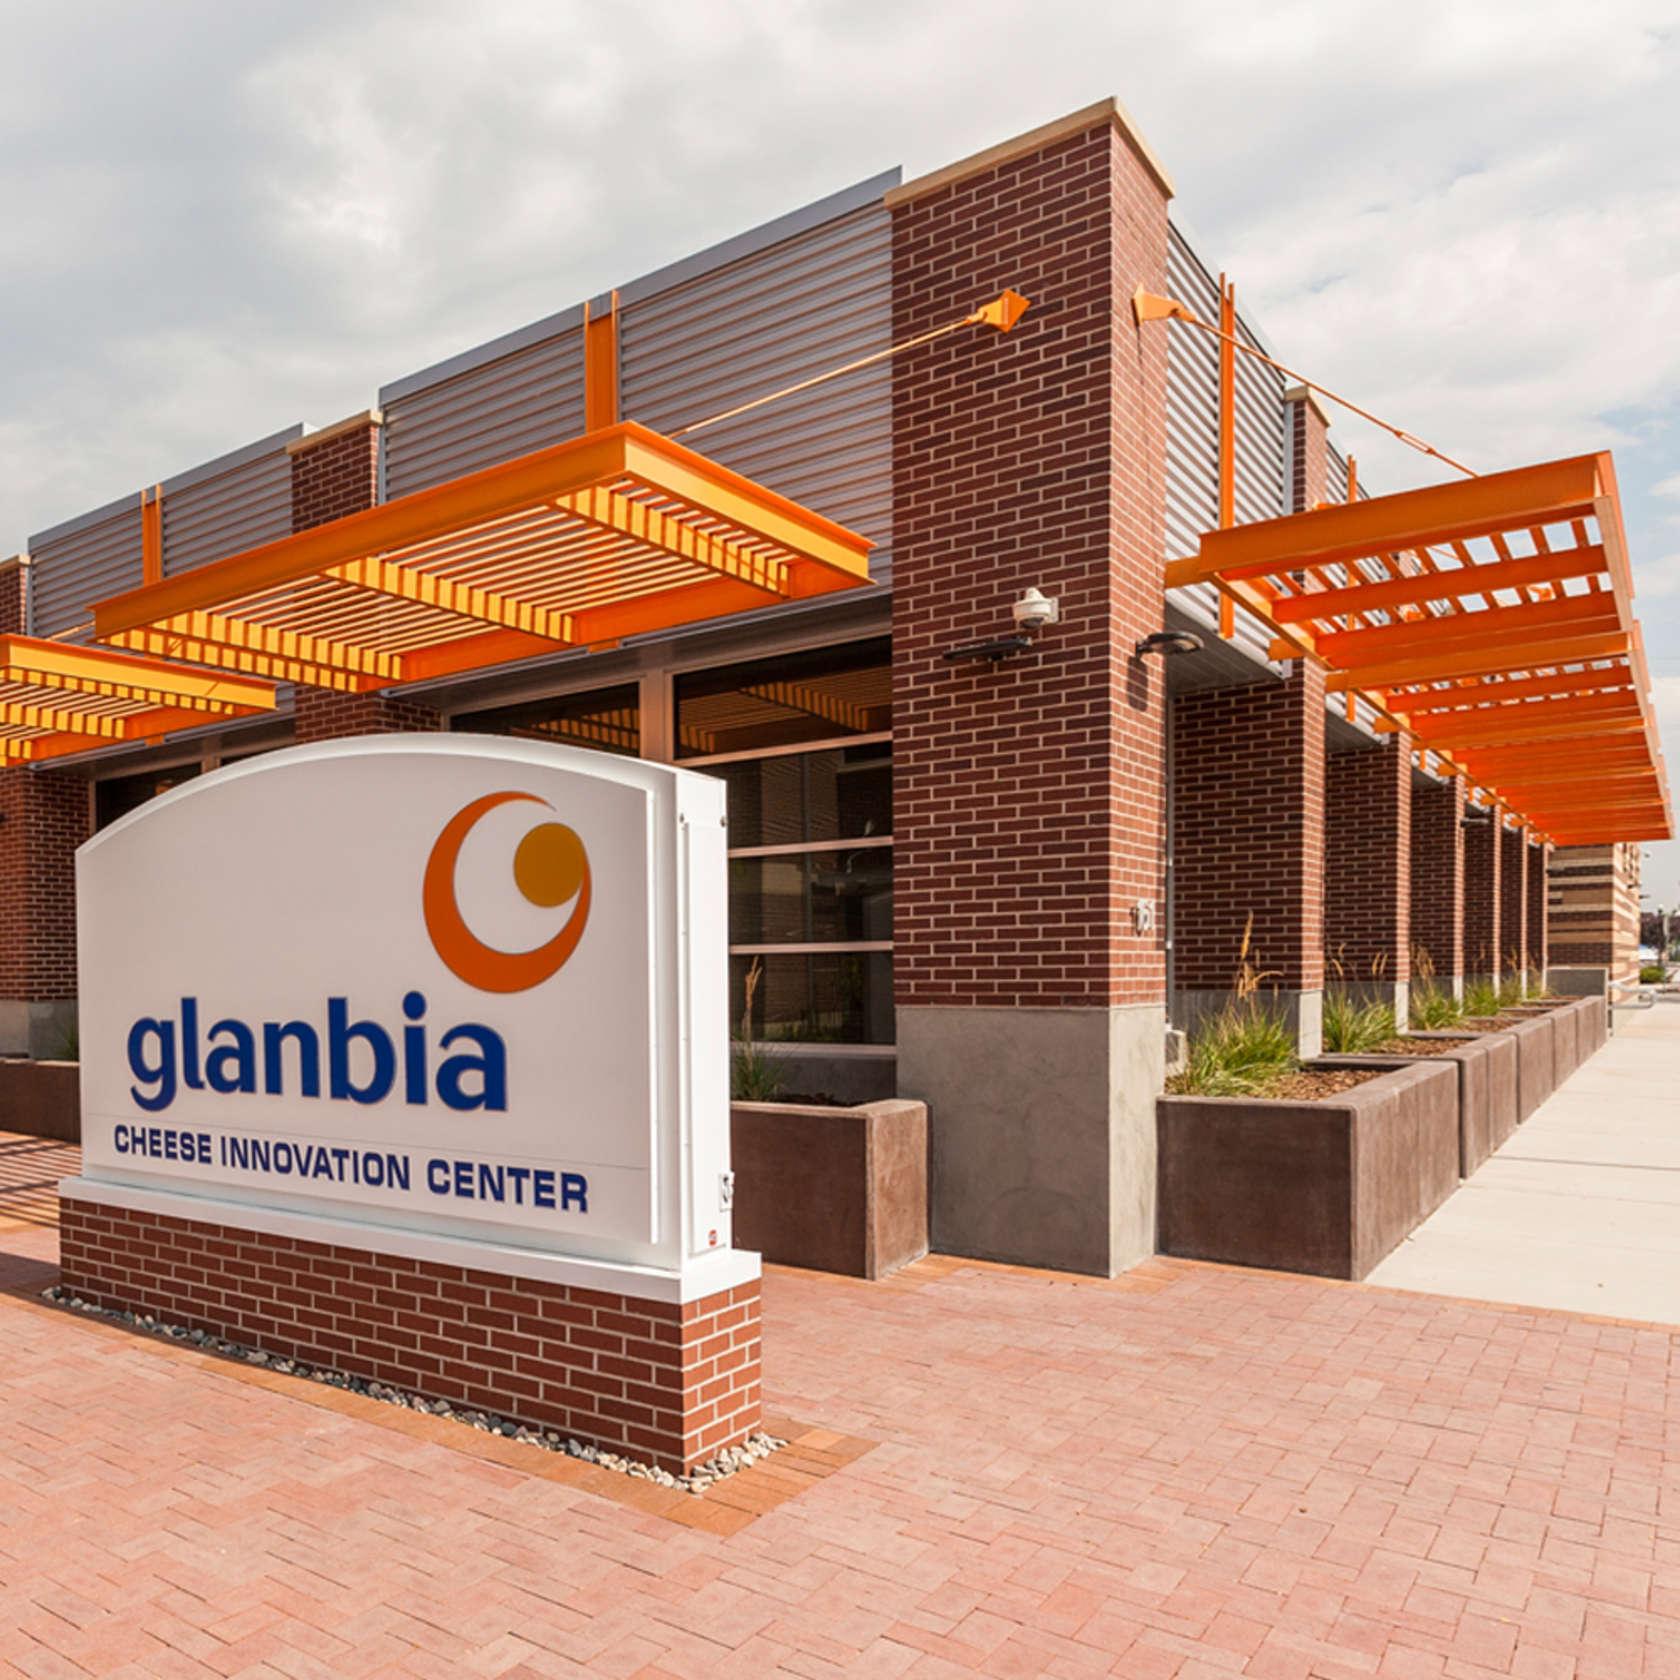 Glanbia Cheese Innovation Center